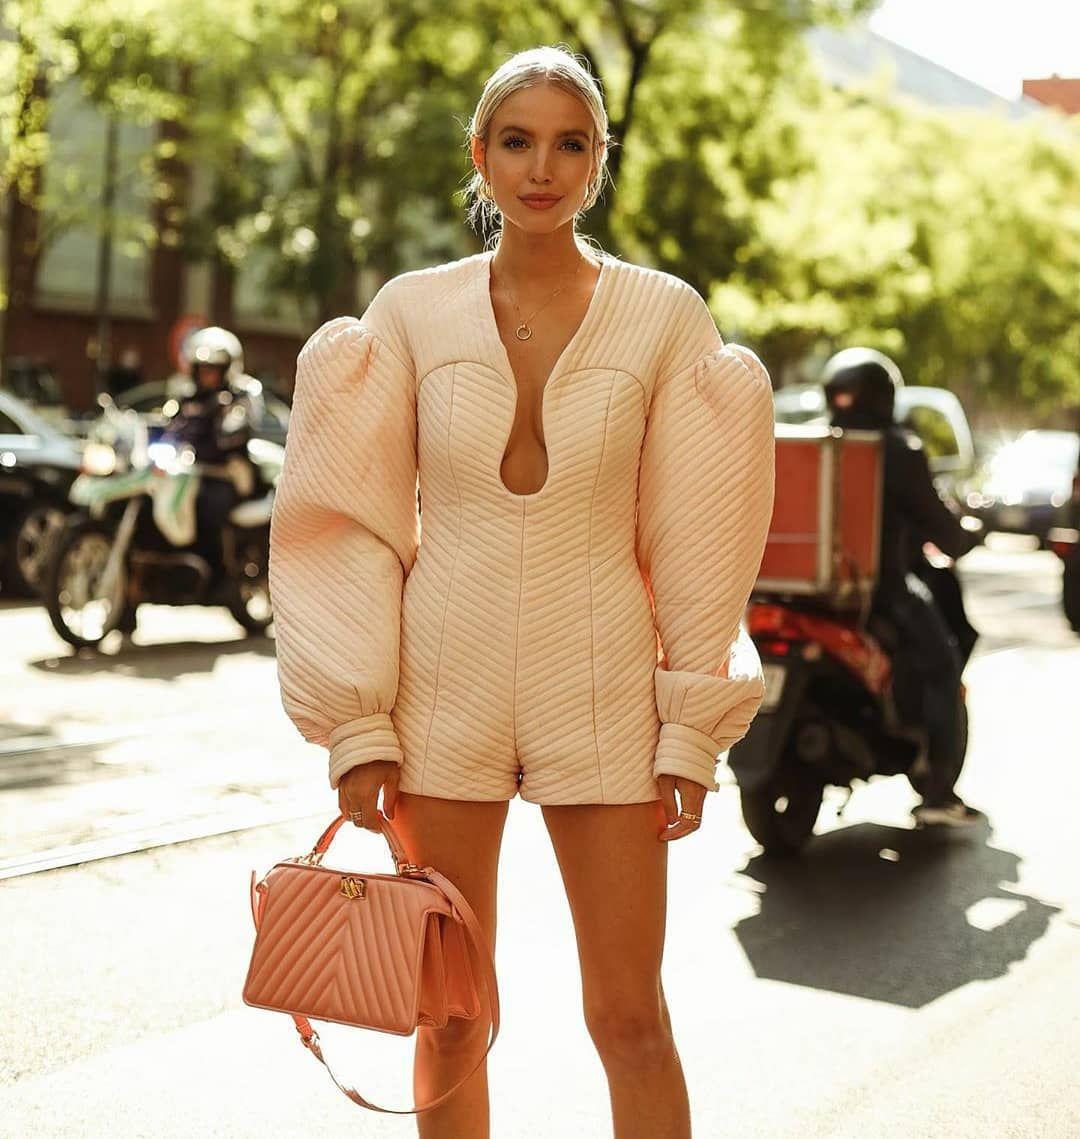 "Pearls™ on Instagram: ""Details™ 💗 #details #streetstyle #streetfashion #fashion #style #fashionstyle #trend #ootd #runway #fashionshow #glam #fashionworld…"""